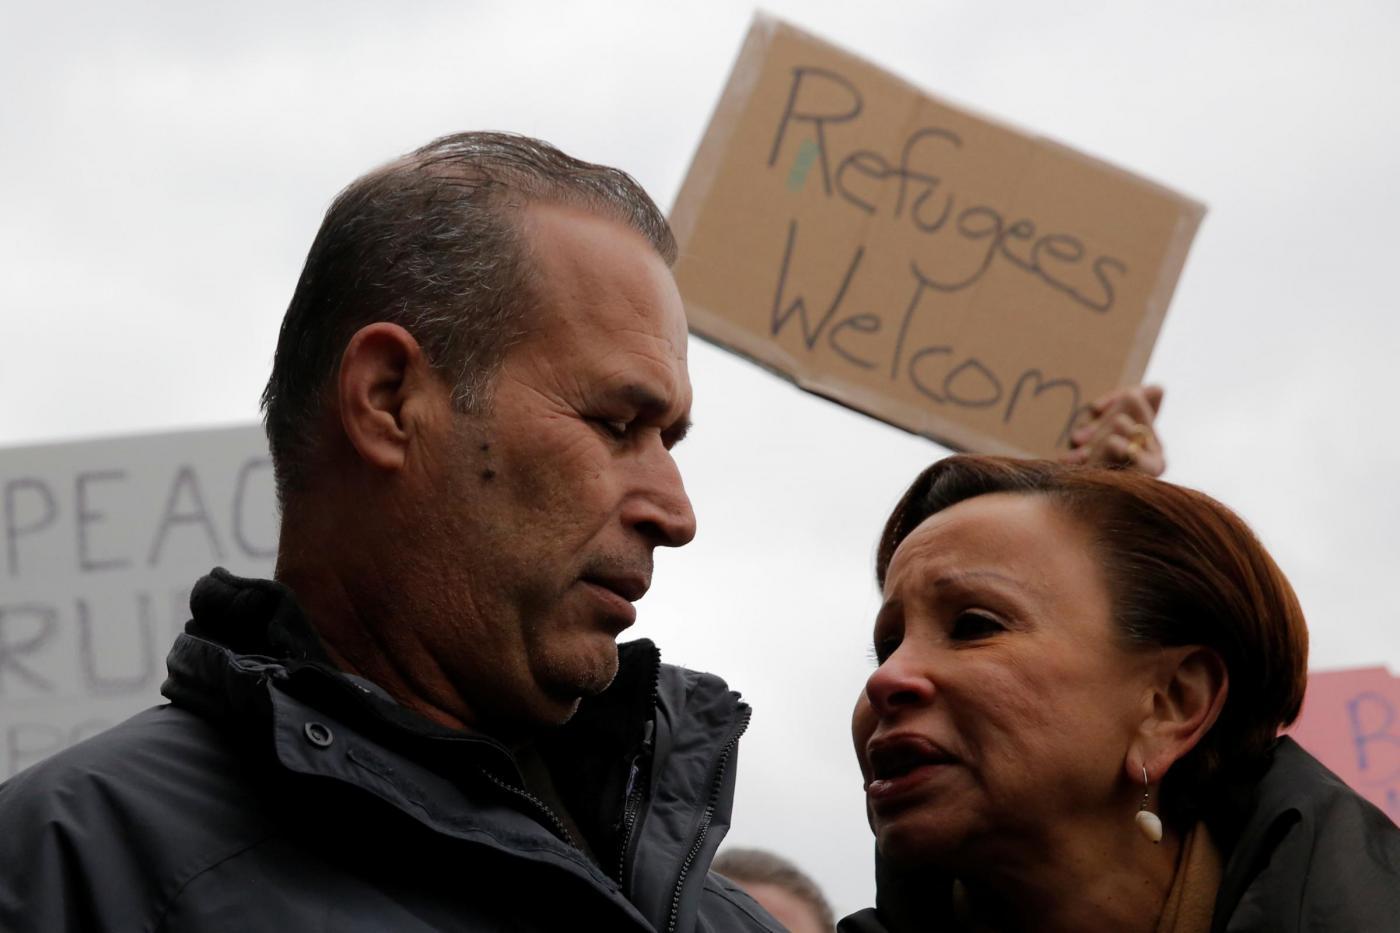 Usa, niente visti a 7 Paesi islamici: proteste all'aeroporto JFK